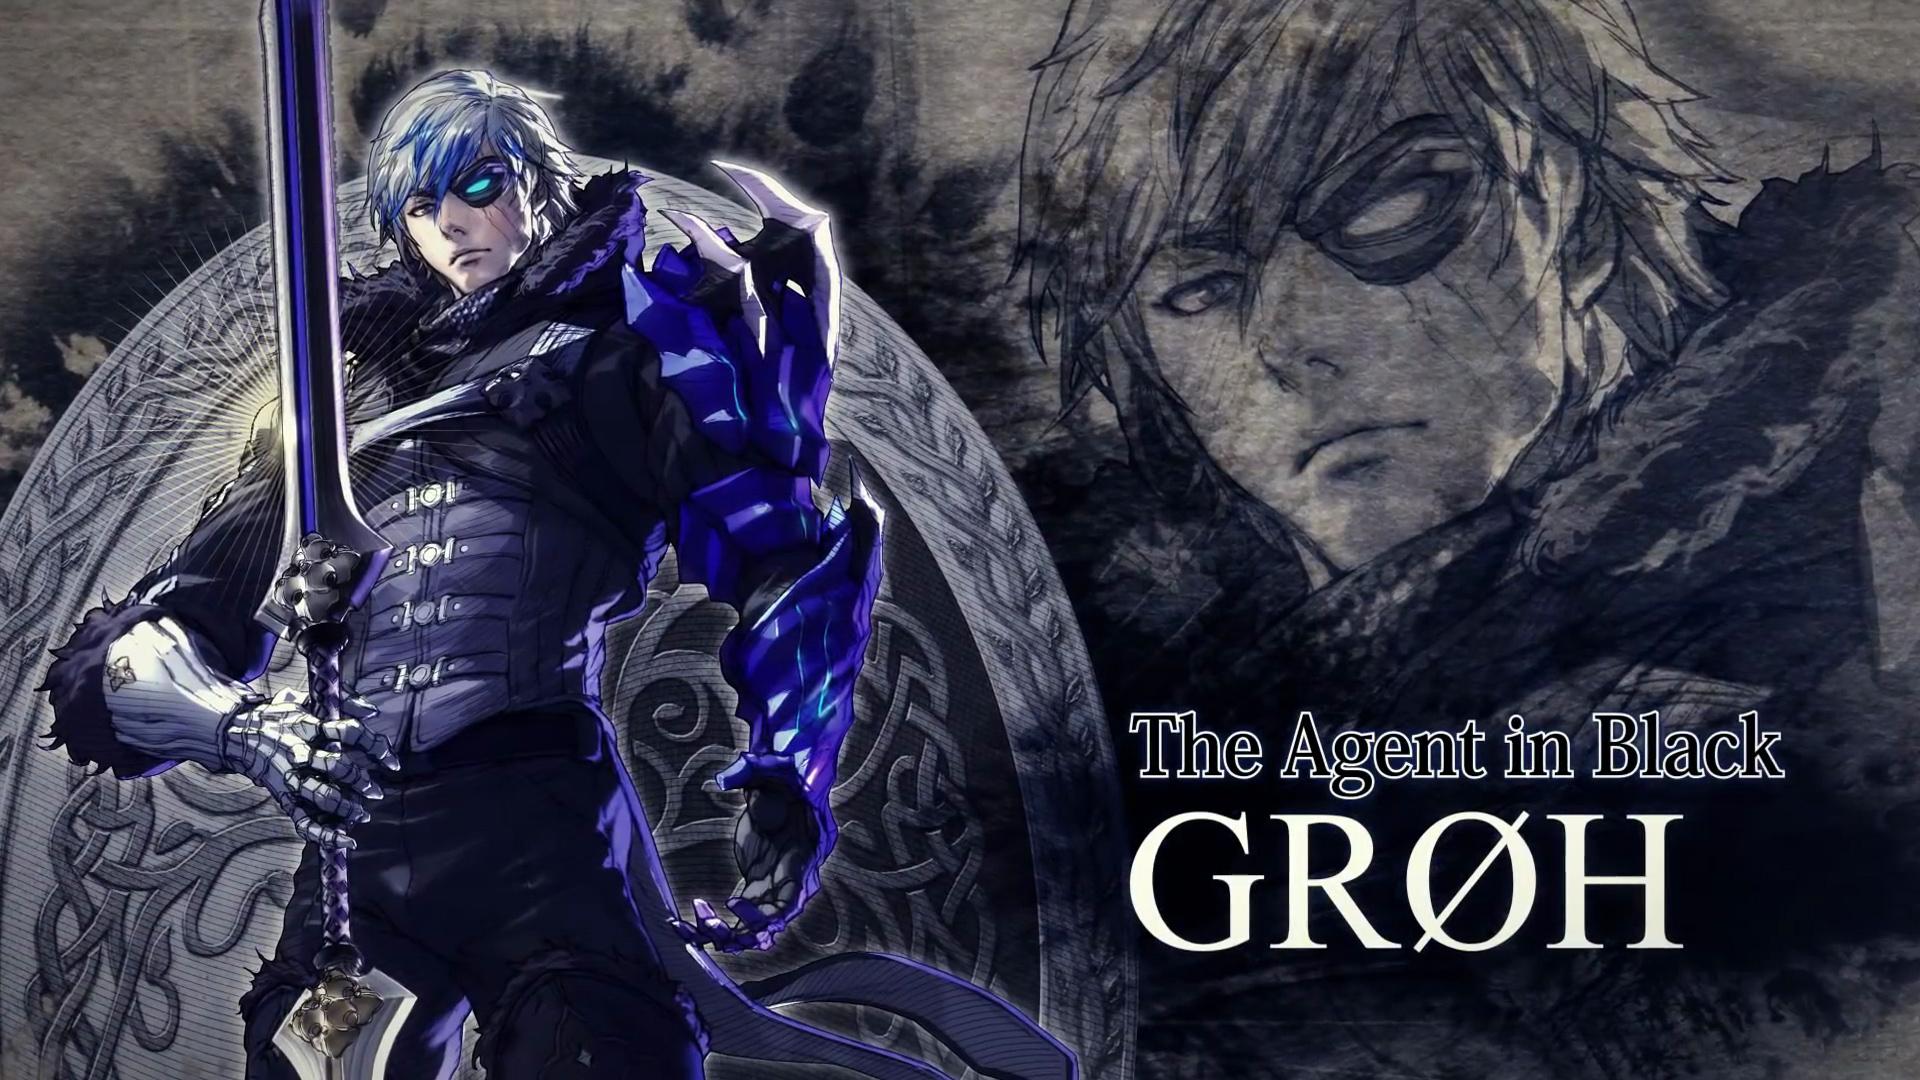 Wallpaper From Soulcalibur Vi Soul Calibur 6 New Character 1241556 Hd Wallpaper Backgrounds Download